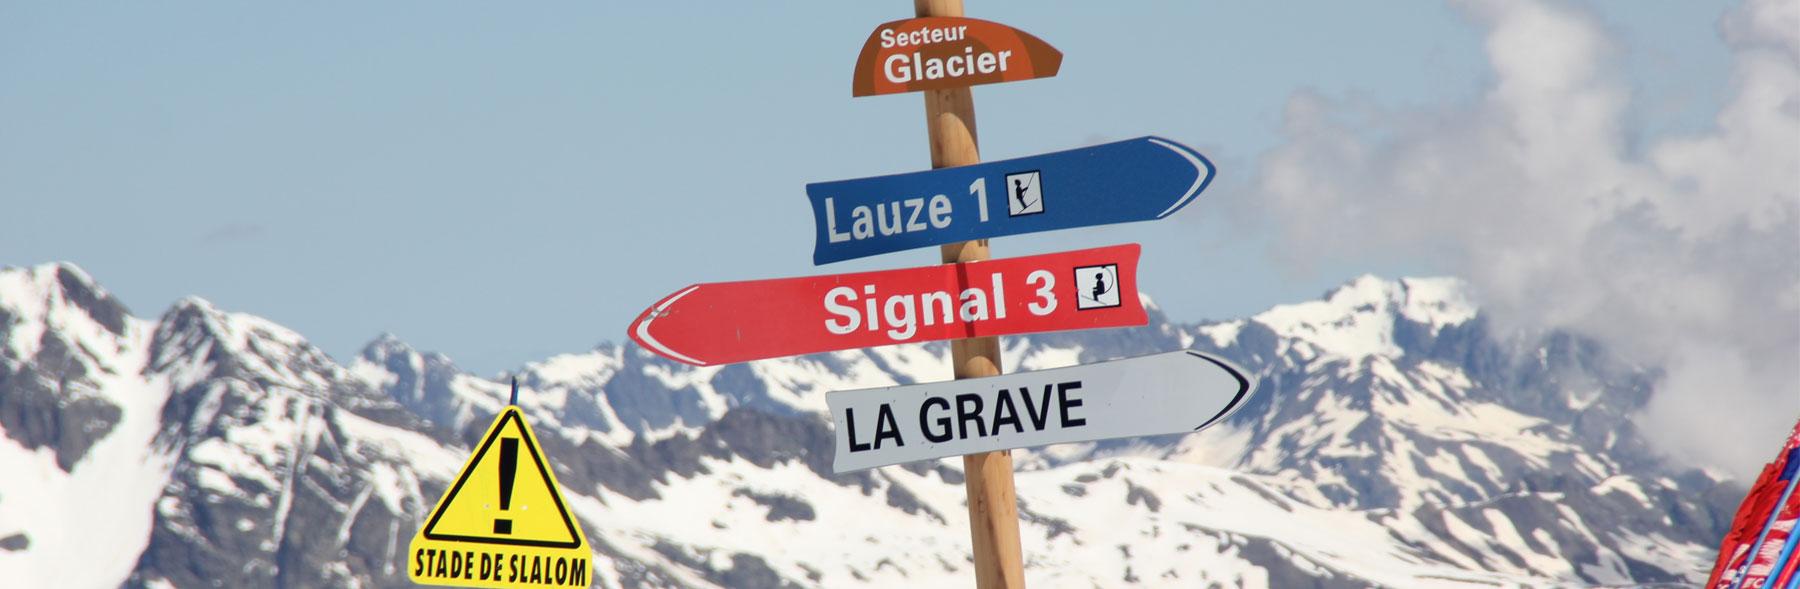 safe_formacion-tecnico_deportivo_nivel_1-esqui_alpino-les_deux_alpes-verano2018-slider